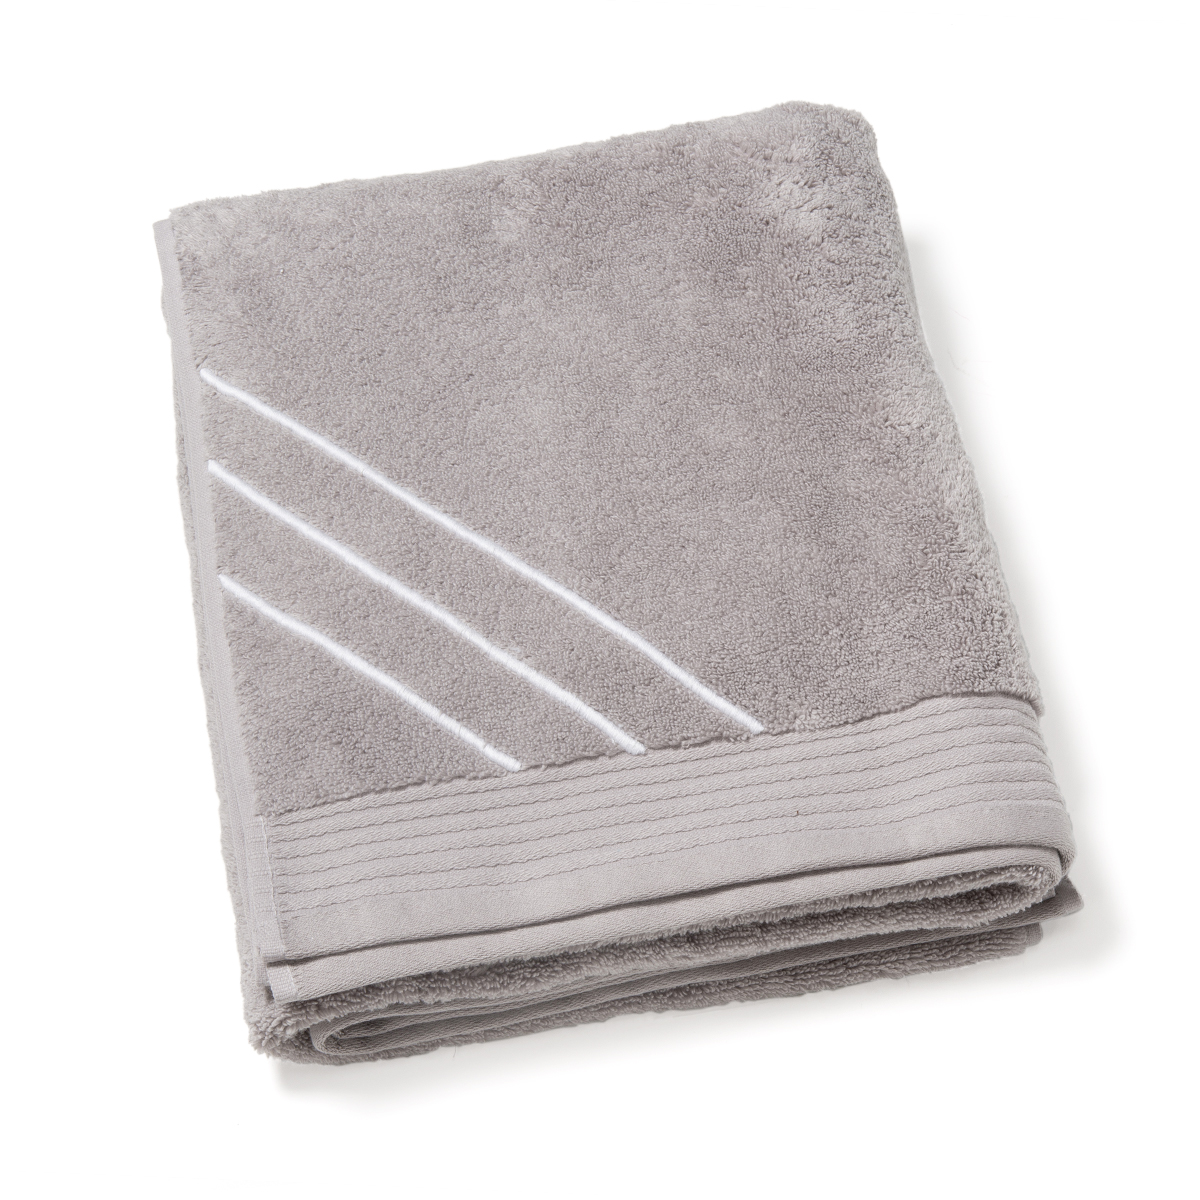 drap de bain brod main taupe gris clair. Black Bedroom Furniture Sets. Home Design Ideas